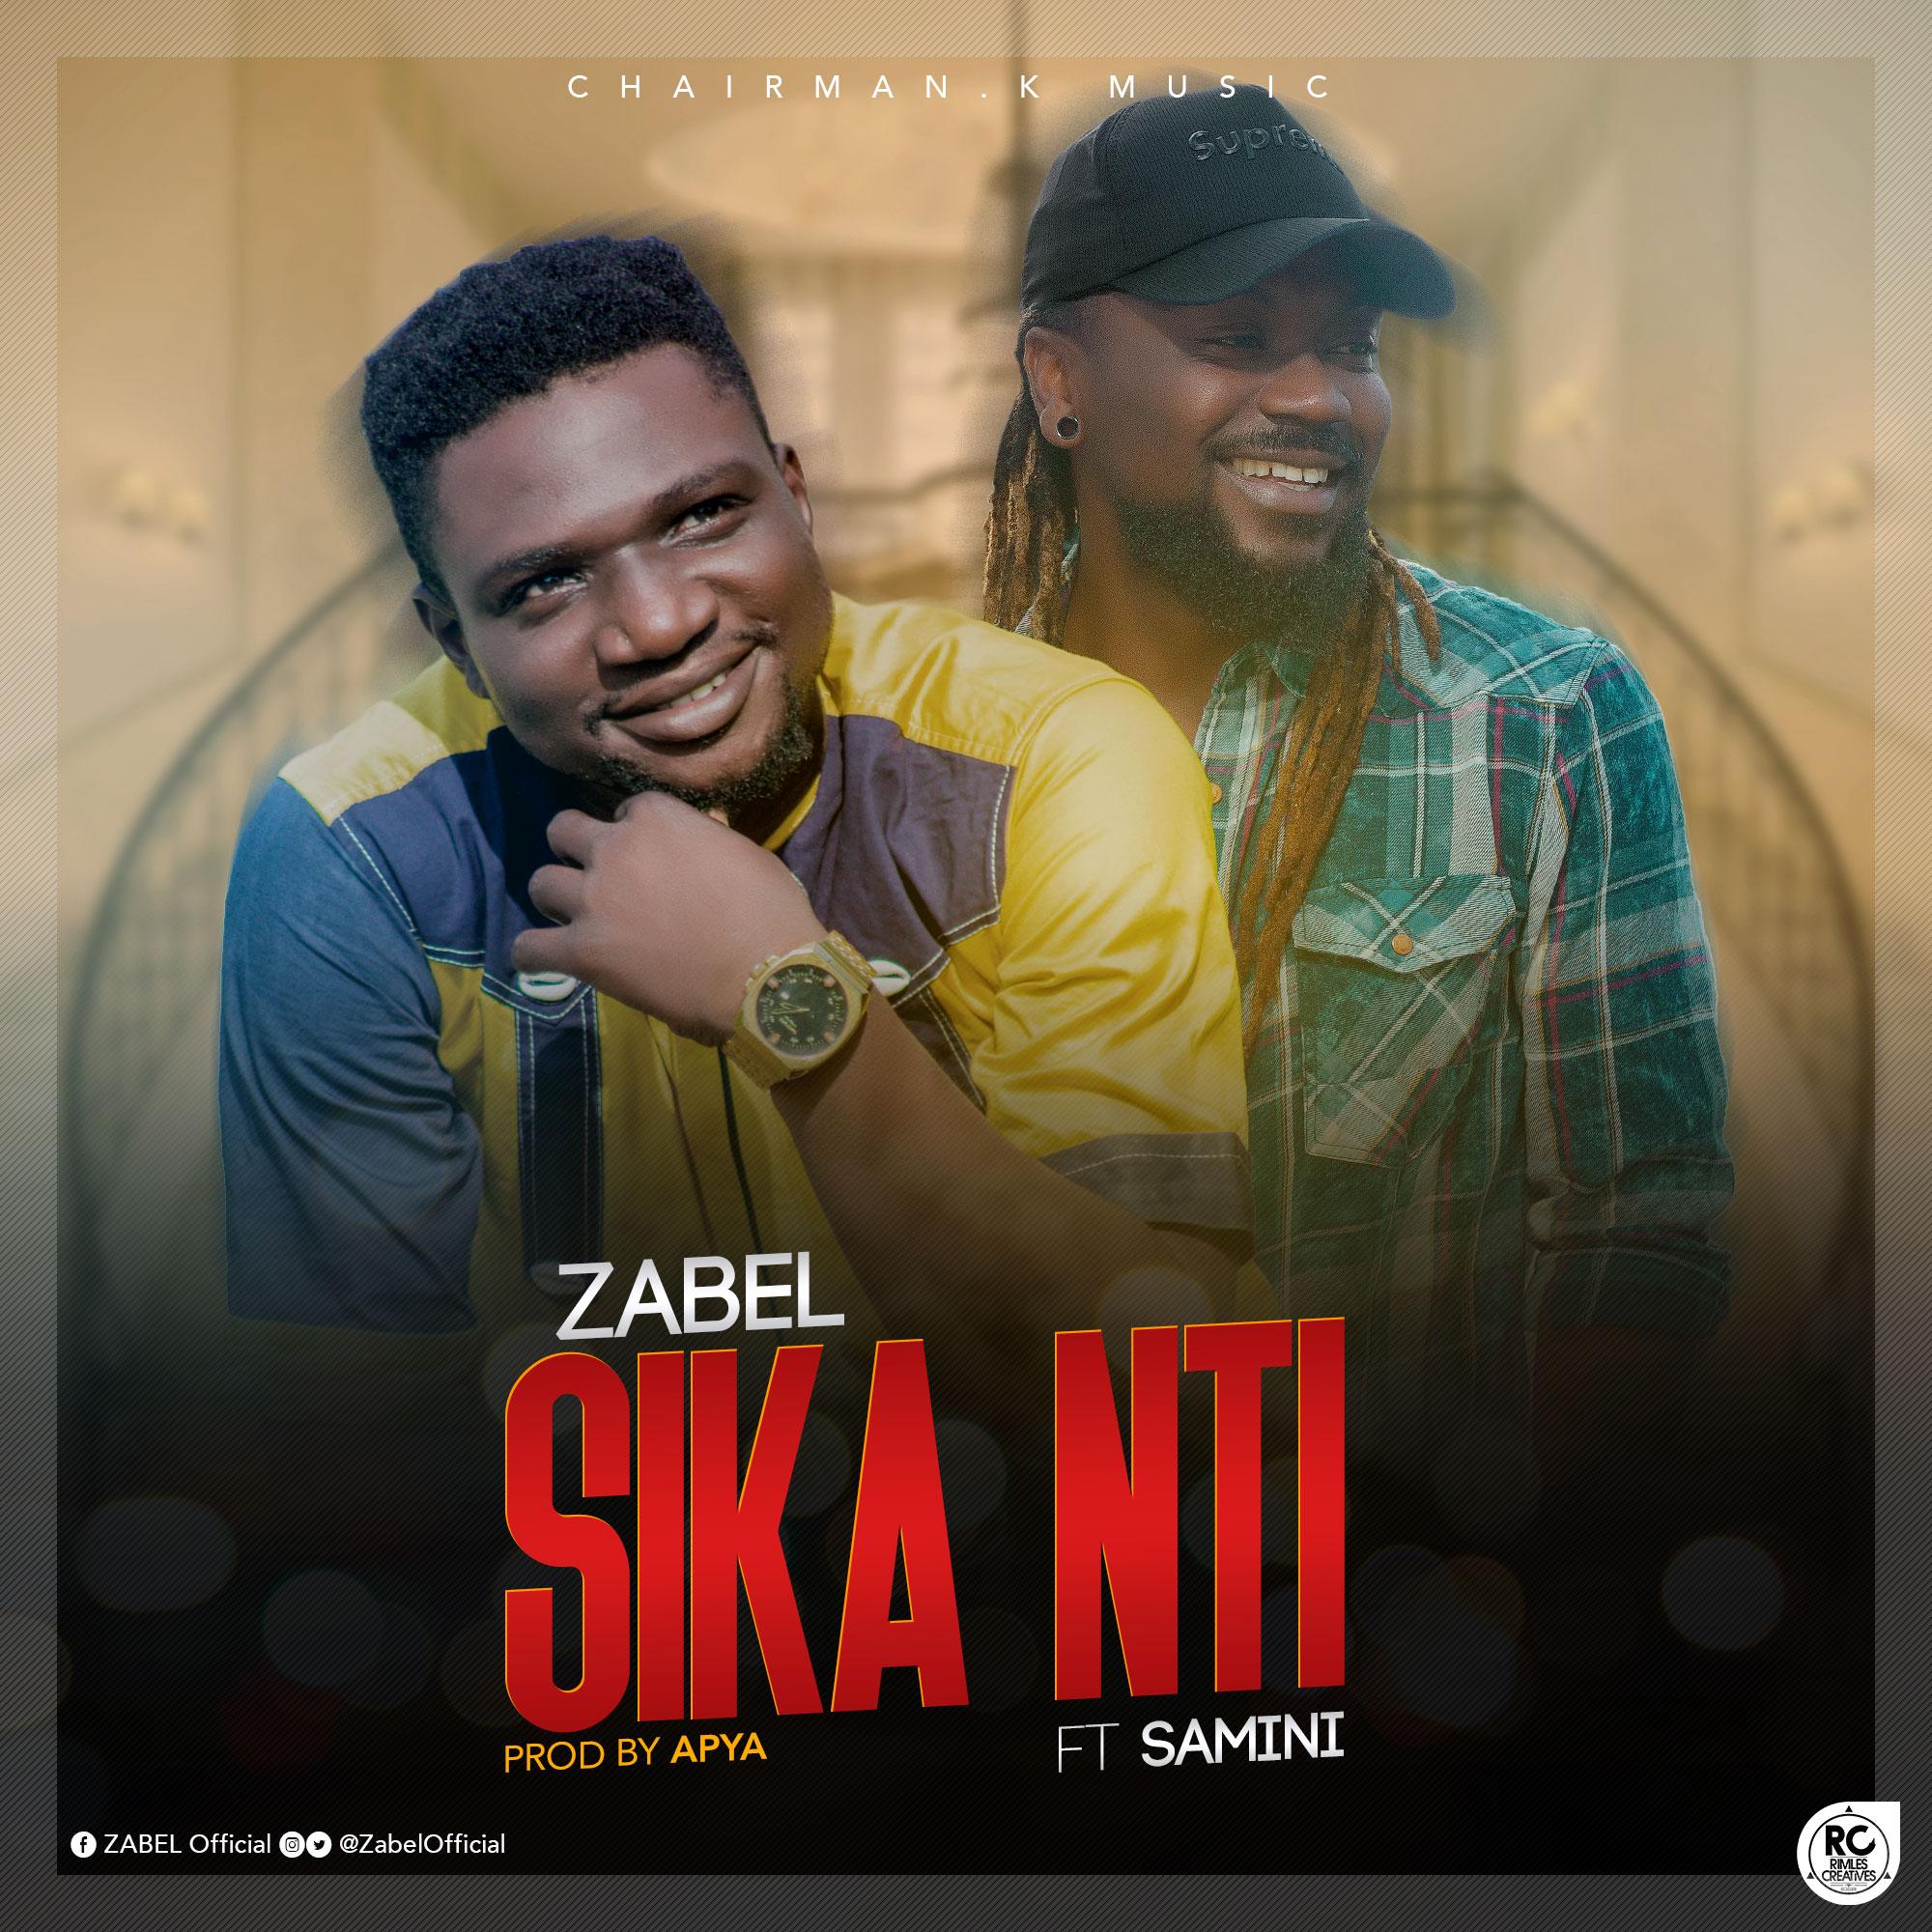 Zabel ft. Samini – Sika Nti (Prod. by Apya)